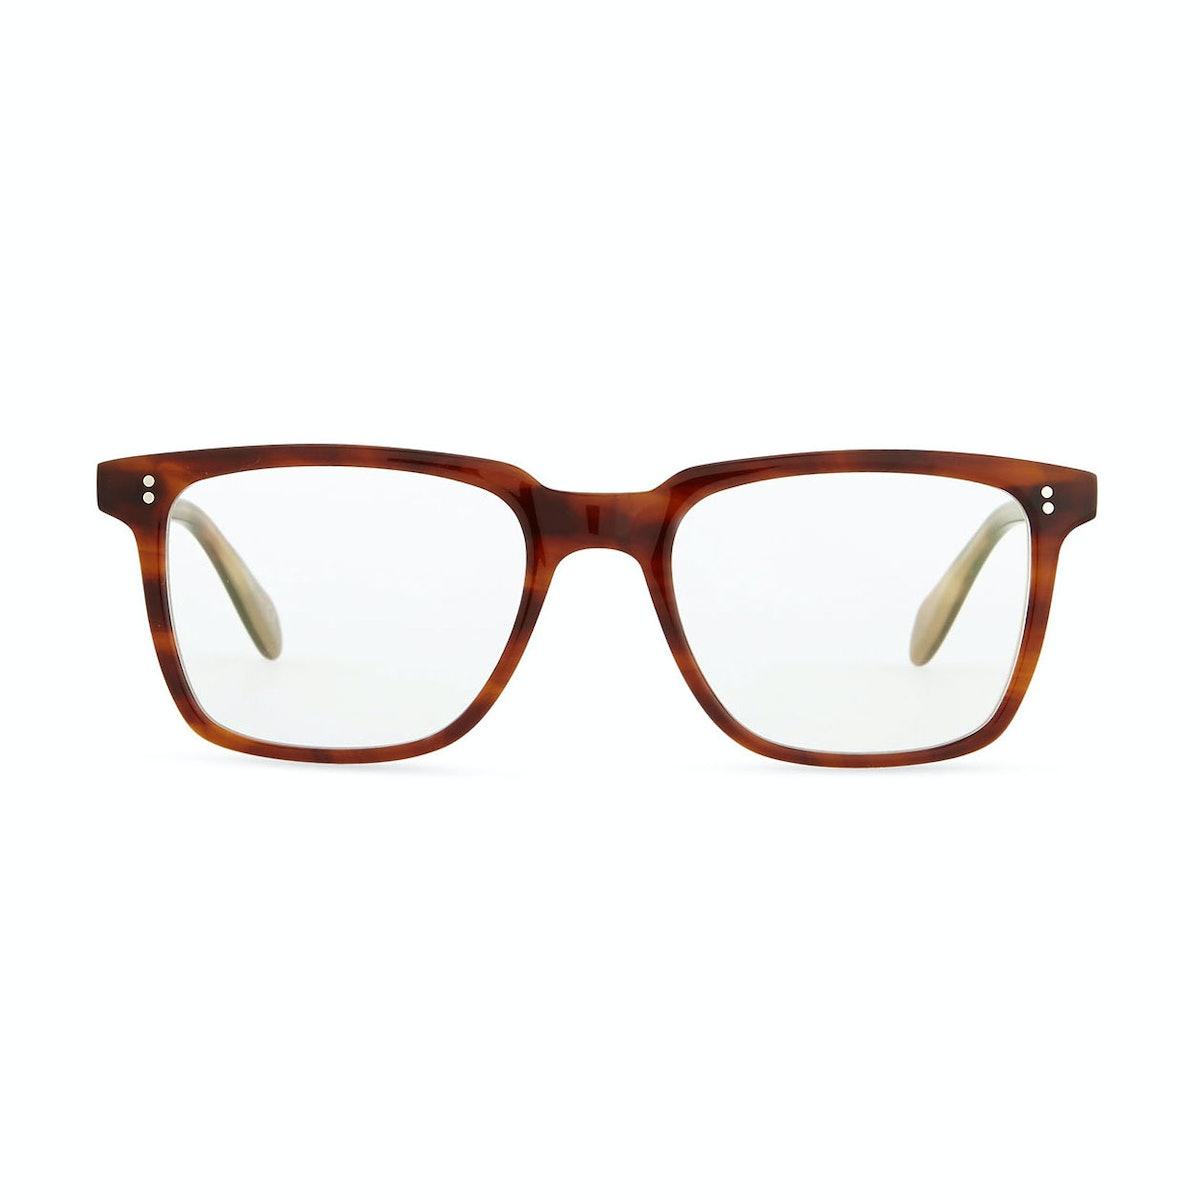 Oliver Peoples opticals